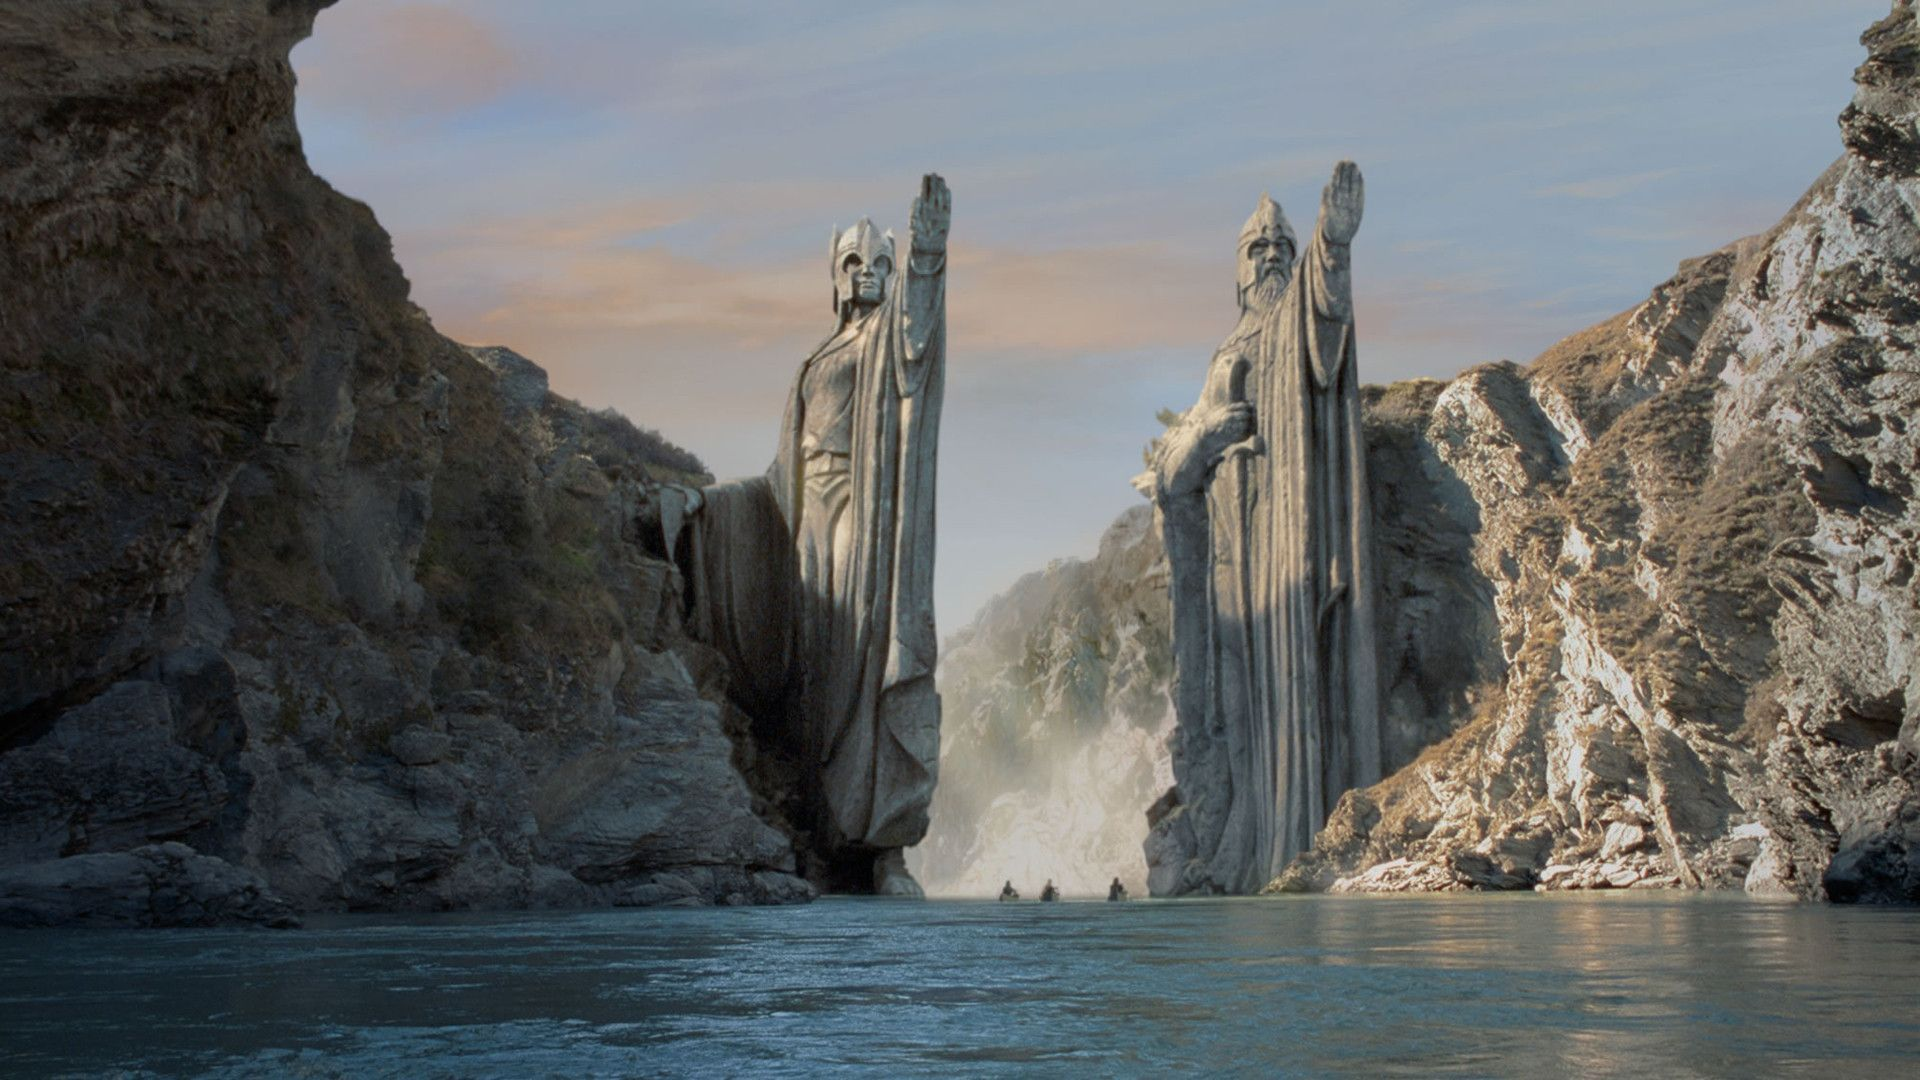 Lord Of The Rings Wallpaper Hd Imashon Com Senhor Dos Aneis O